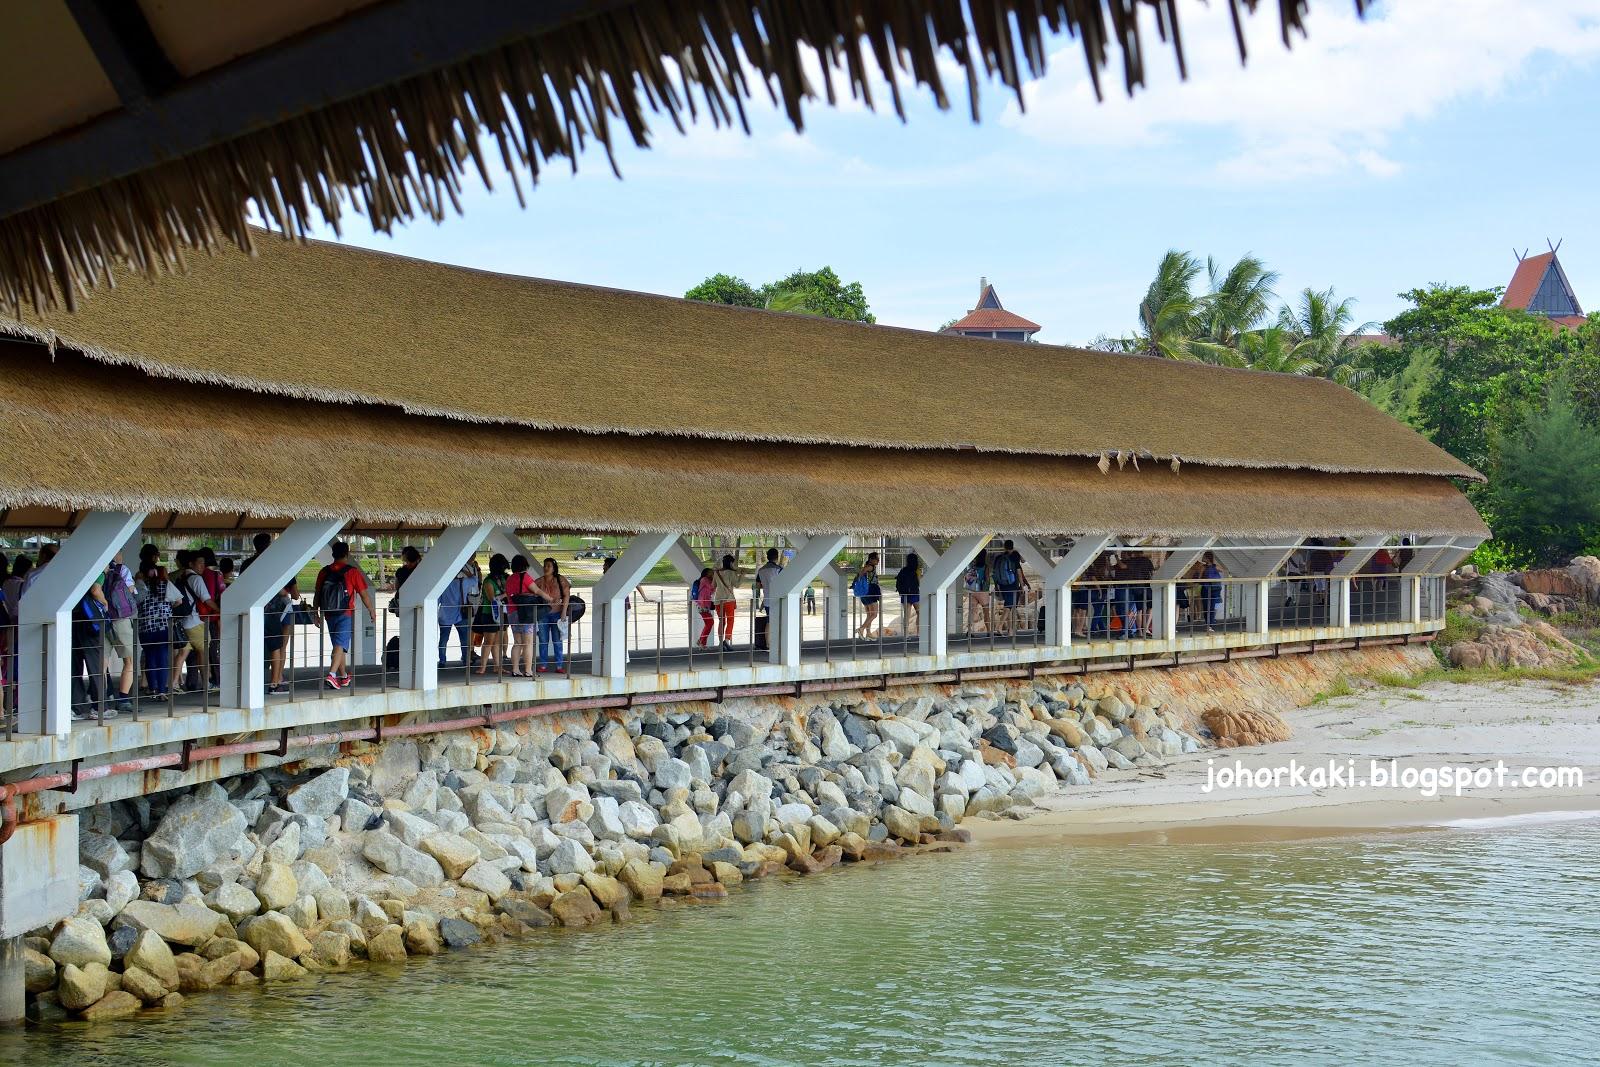 Bintan Lagoon Resort Blr Indonesia Johor Kaki Travels For Food